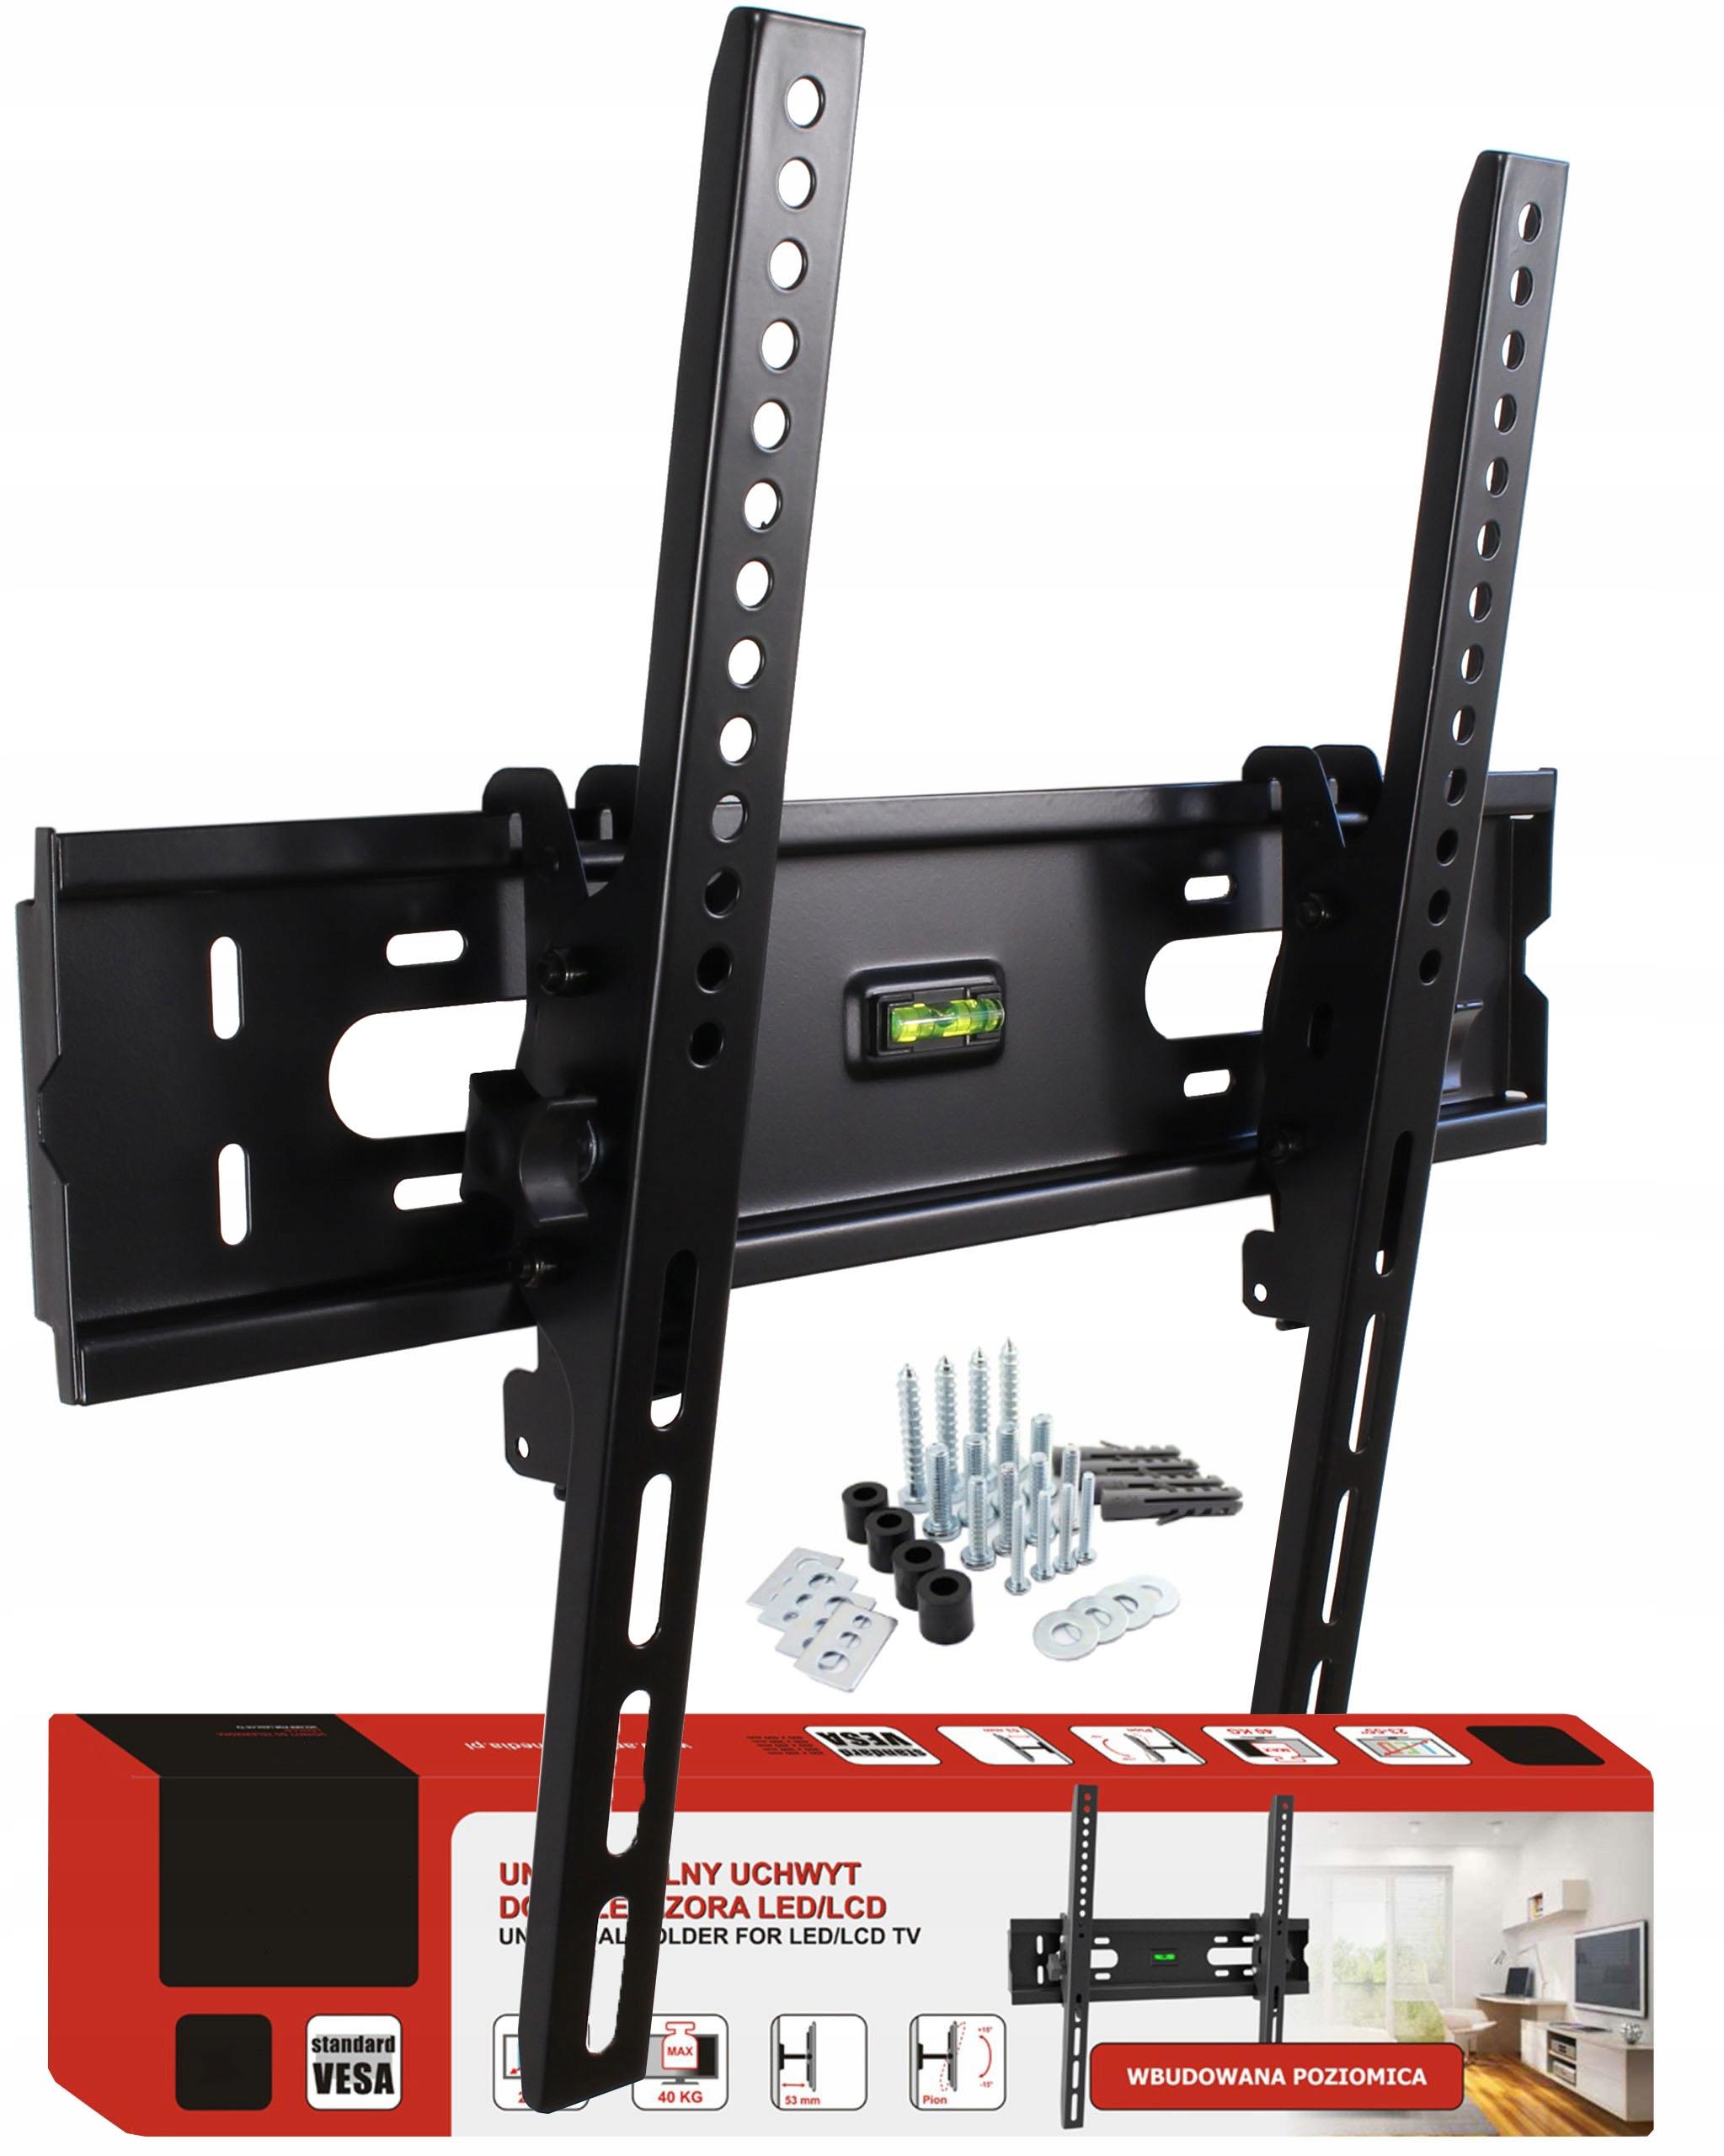 TV HANGER TV HANGER 23 - 55 40 кг СИЛЬНЫЙ